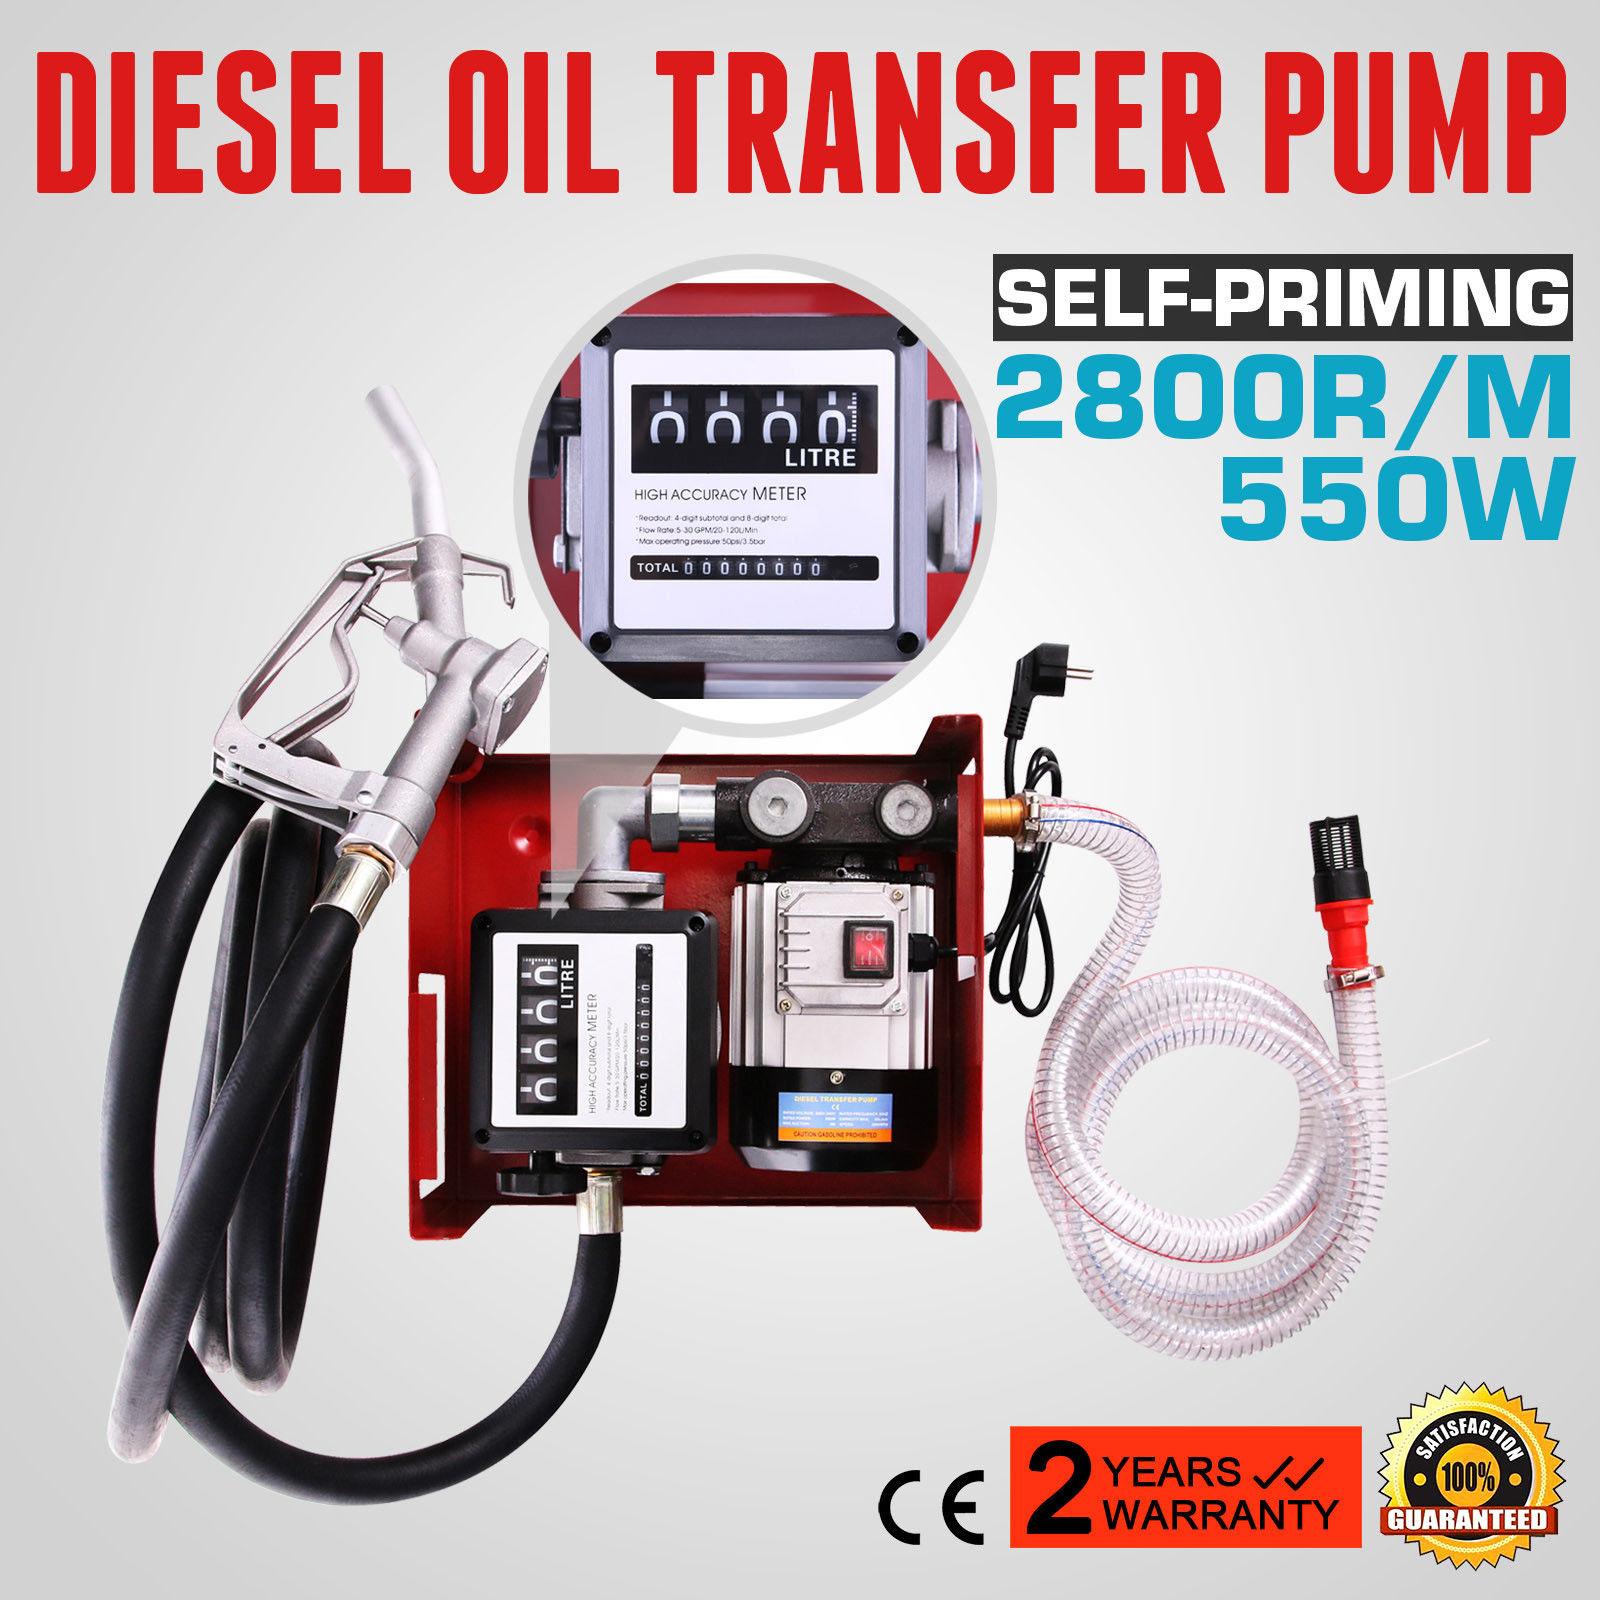 550W Self Priming Electric Oil Pump Transfer Bio Fuel Oil Diesel 220v 60L/Min Built-in Bypass Valve Low Voltage